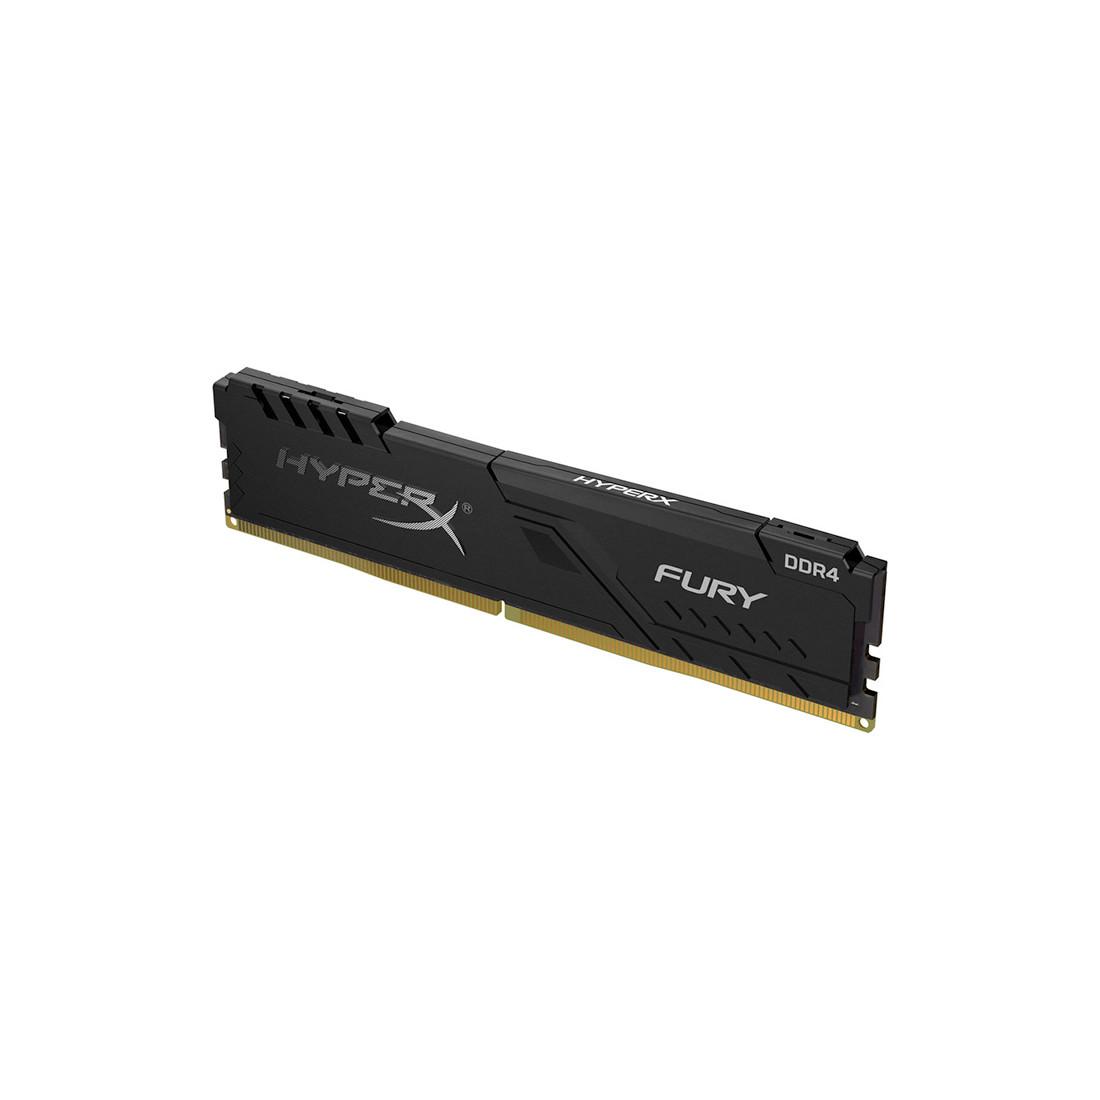 Модуль памяти Kingston HyperX Fury HX434C16FB3/8 DDR4 8G 3466MHz